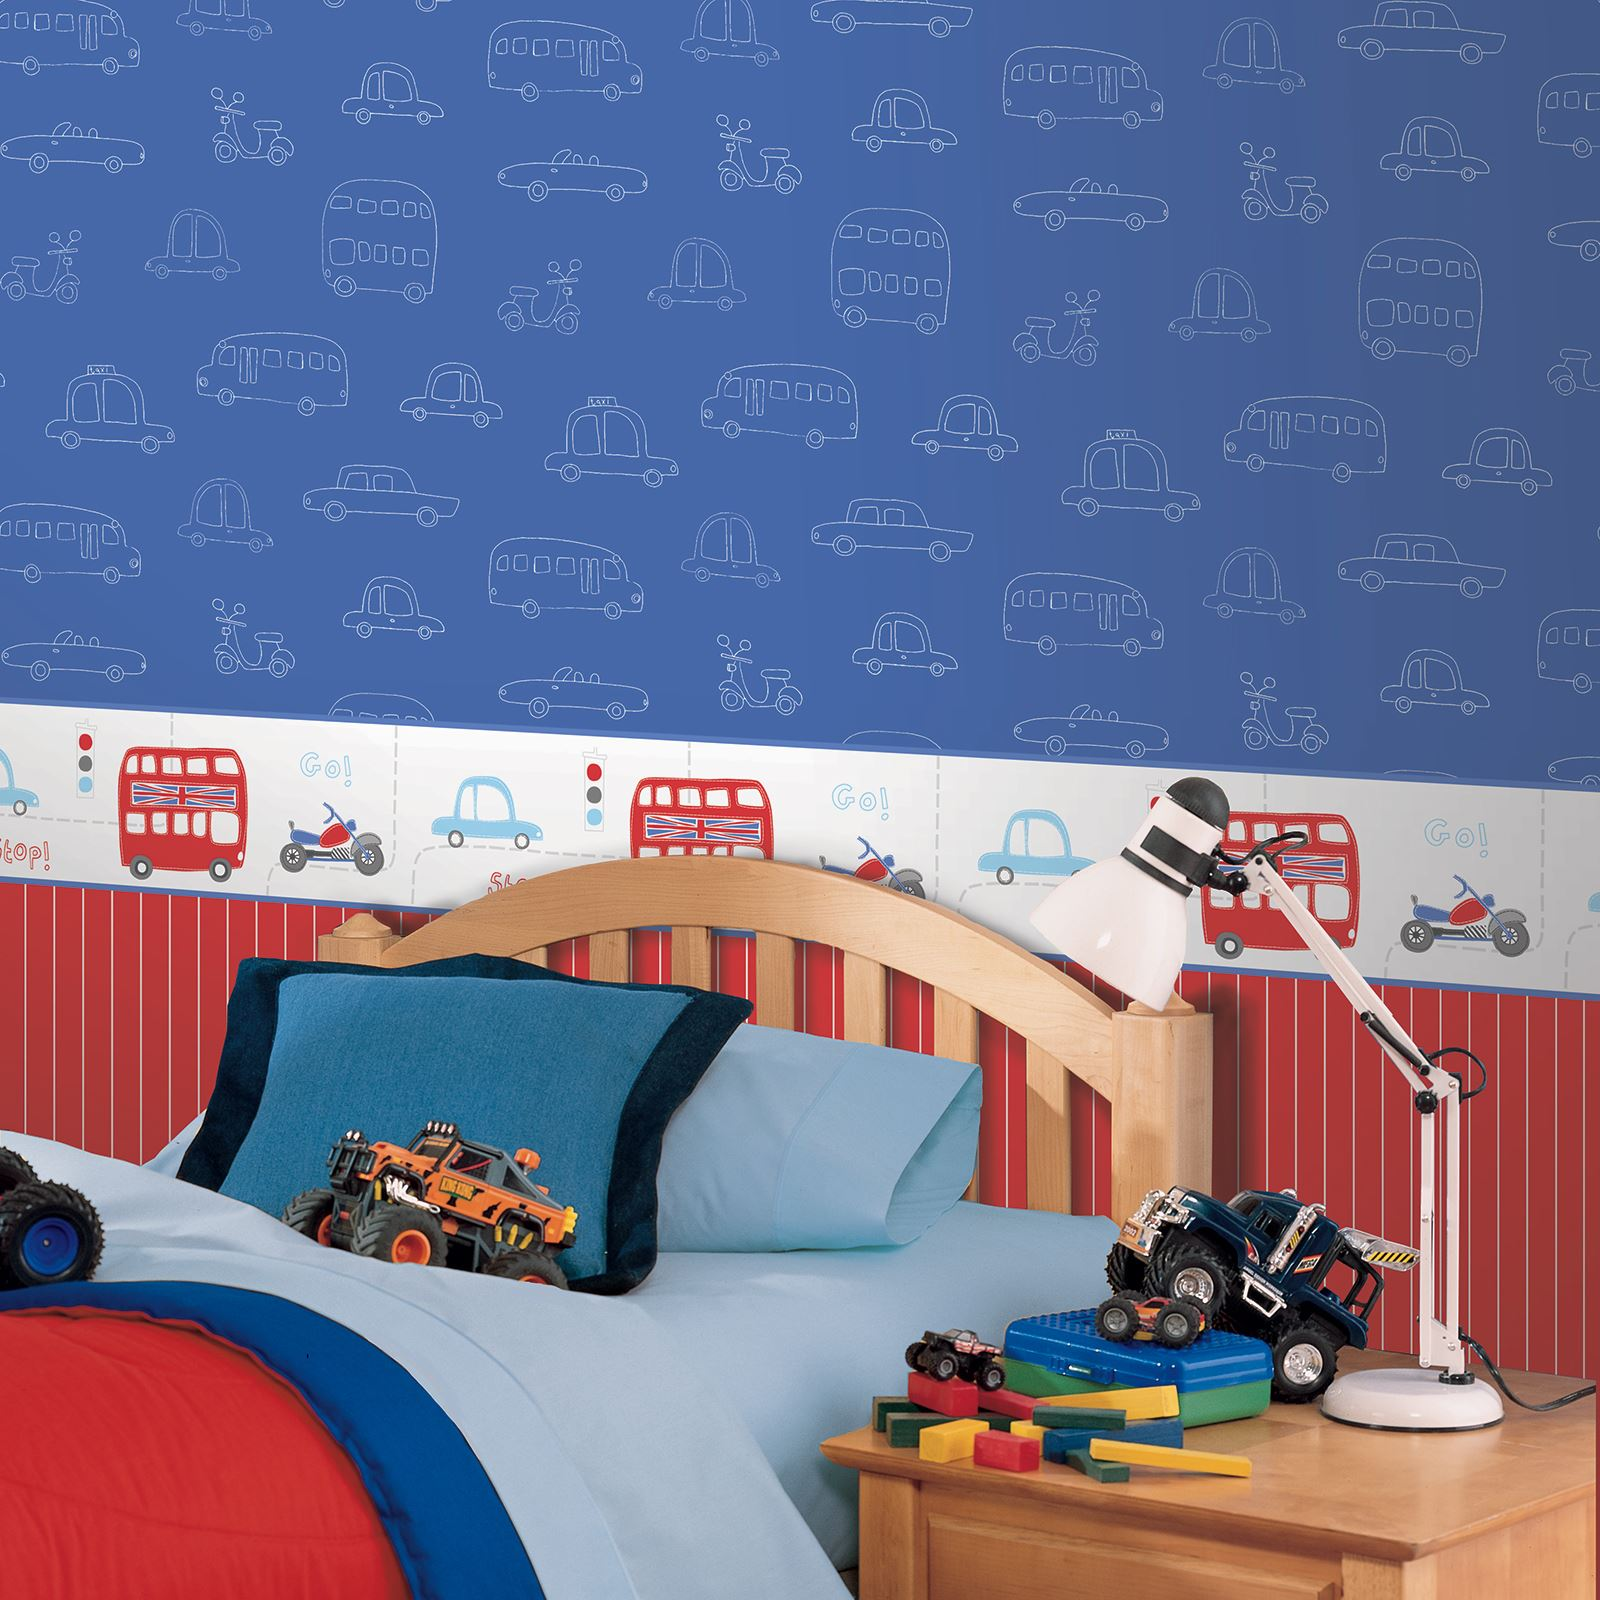 Bedroom Wall Decor Ebay Bedroom Bed Ideas Bedroom Bin B M Anime Bedroom Decor: TRANSPORT AND VEHICLES THEMED WALLPAPER & BORDERS BEDROOM